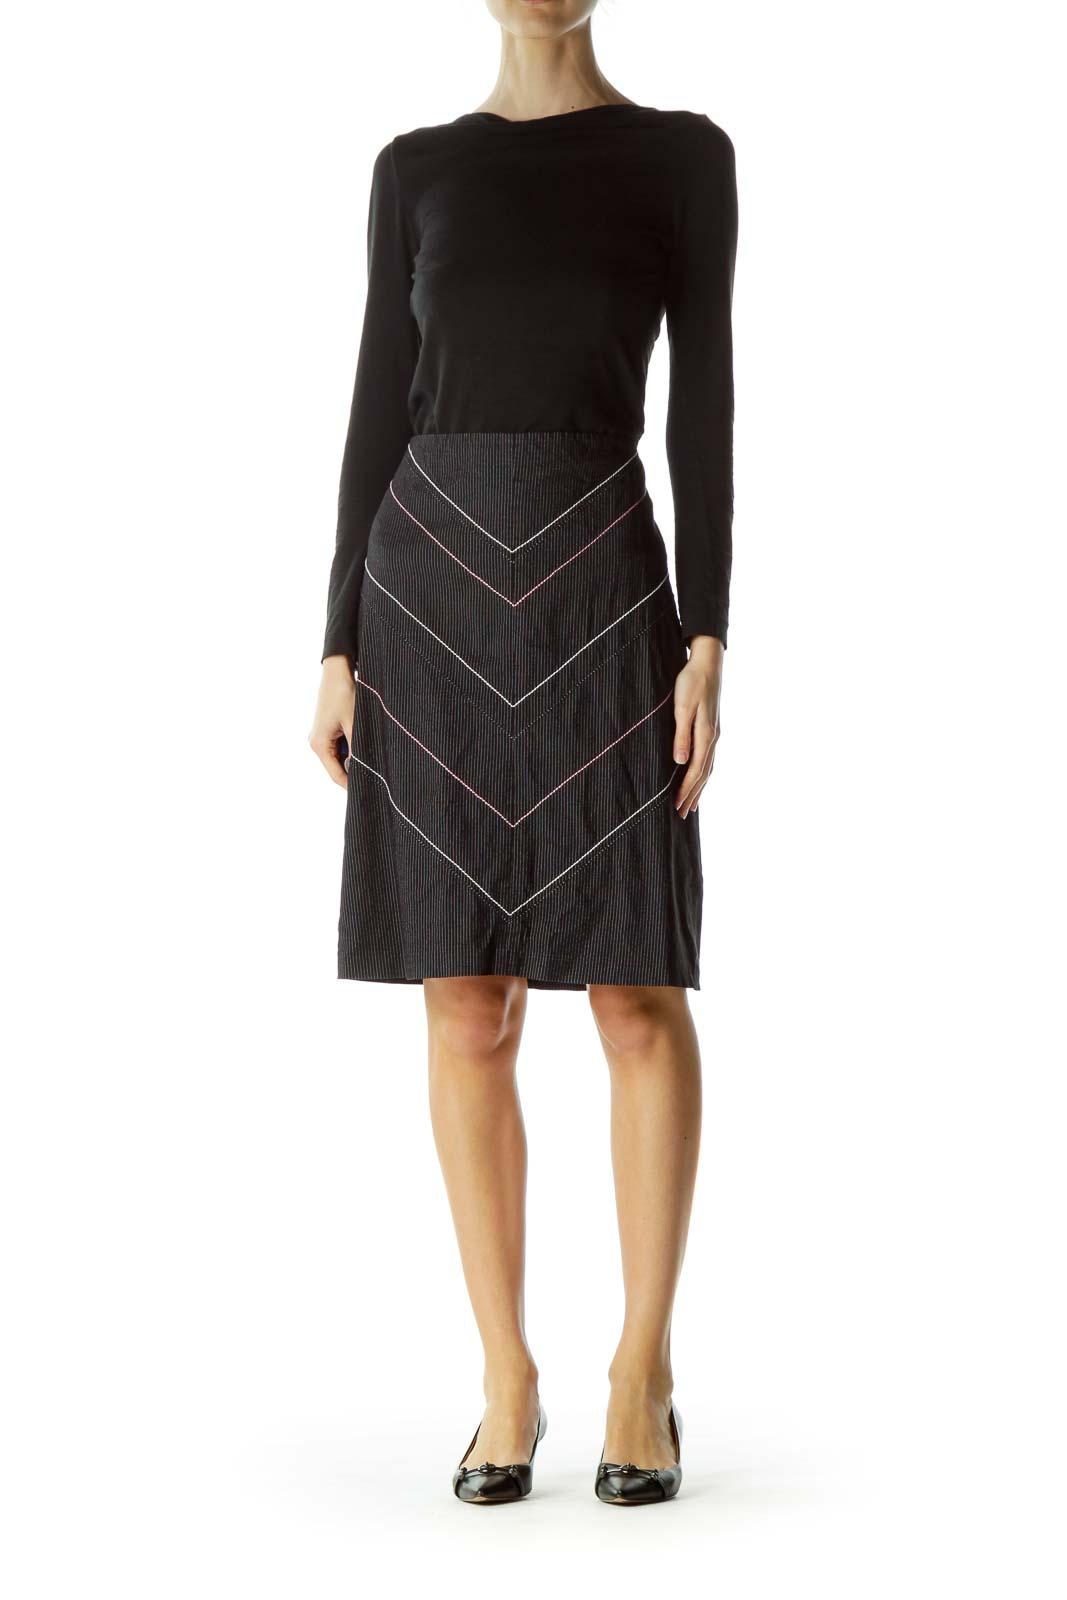 Black White Pinstripe A-Line Skirt